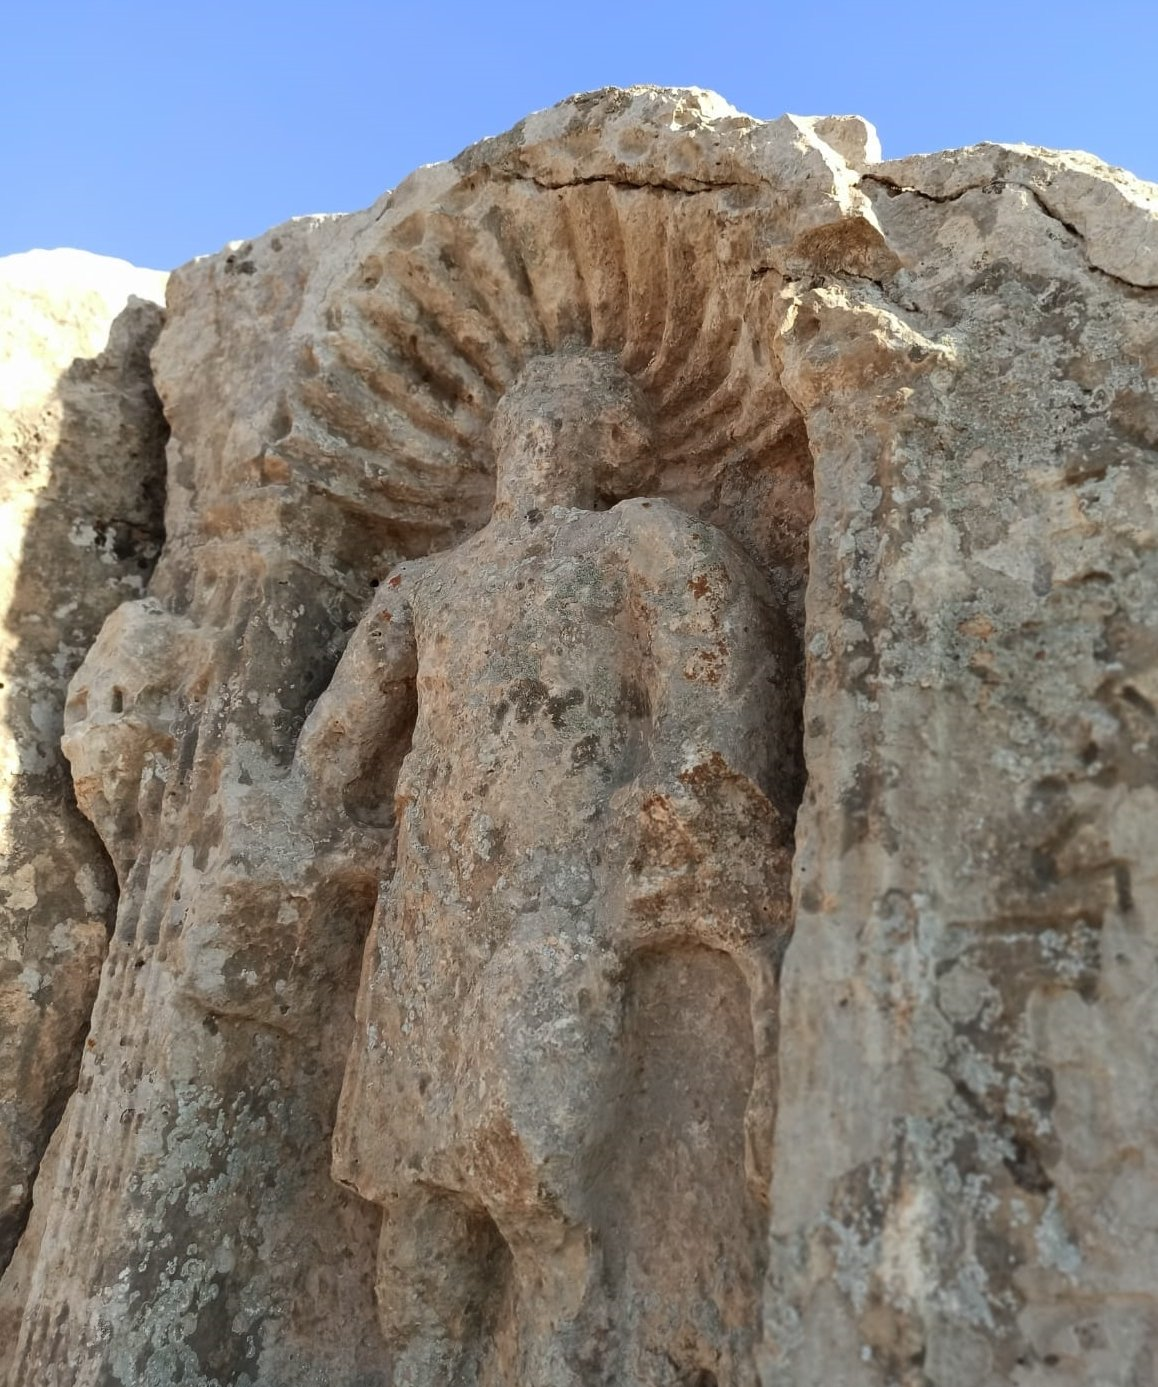 Some archaeological remains from the ancient city of Soğmatar, Şanlıurfa, southeastern Turkey, Aug. 24, 2021. (AA Photo)